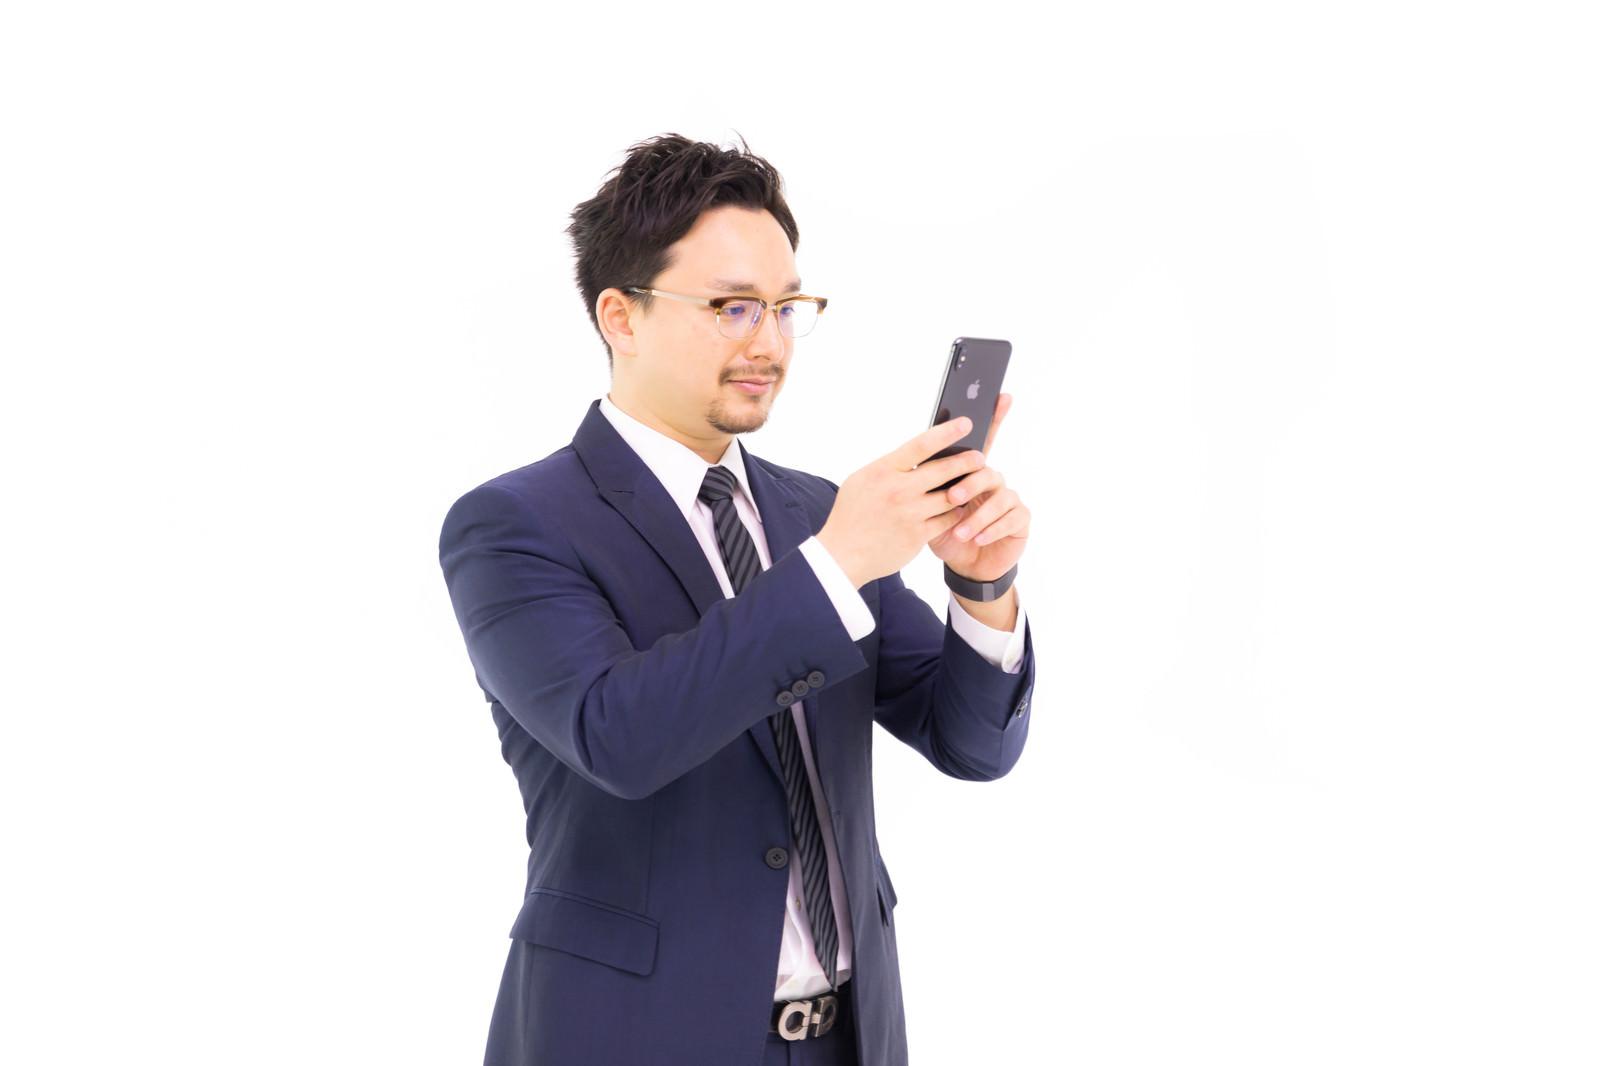 「iPhone XS Max を弄るドイツ人ハーフ | 写真の無料素材・フリー素材 - ぱくたそ」の写真[モデル:Max_Ezaki]